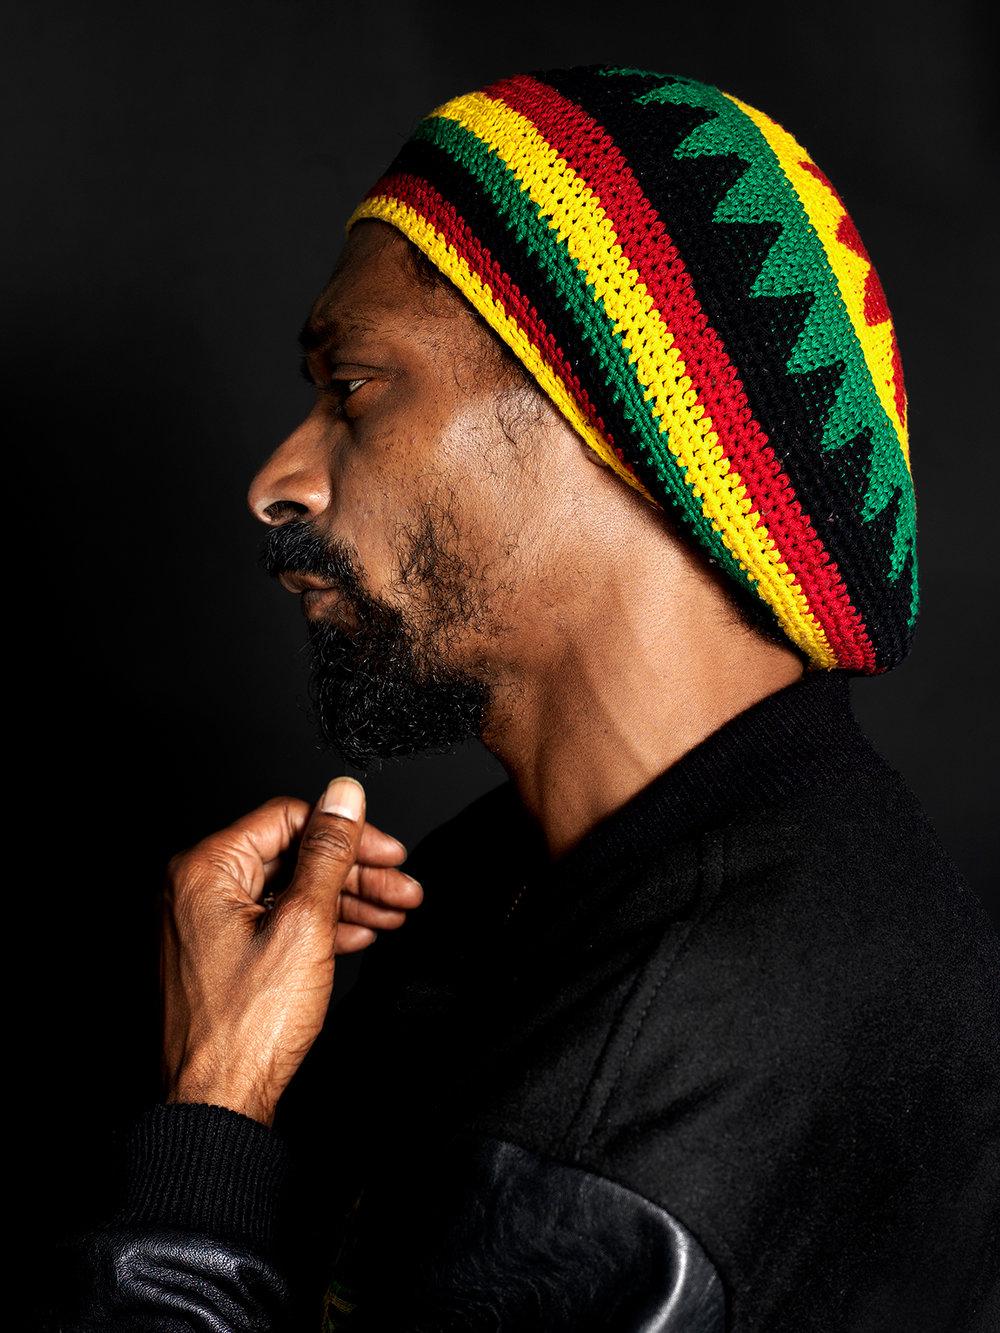 Snoop Dogg's portrait.